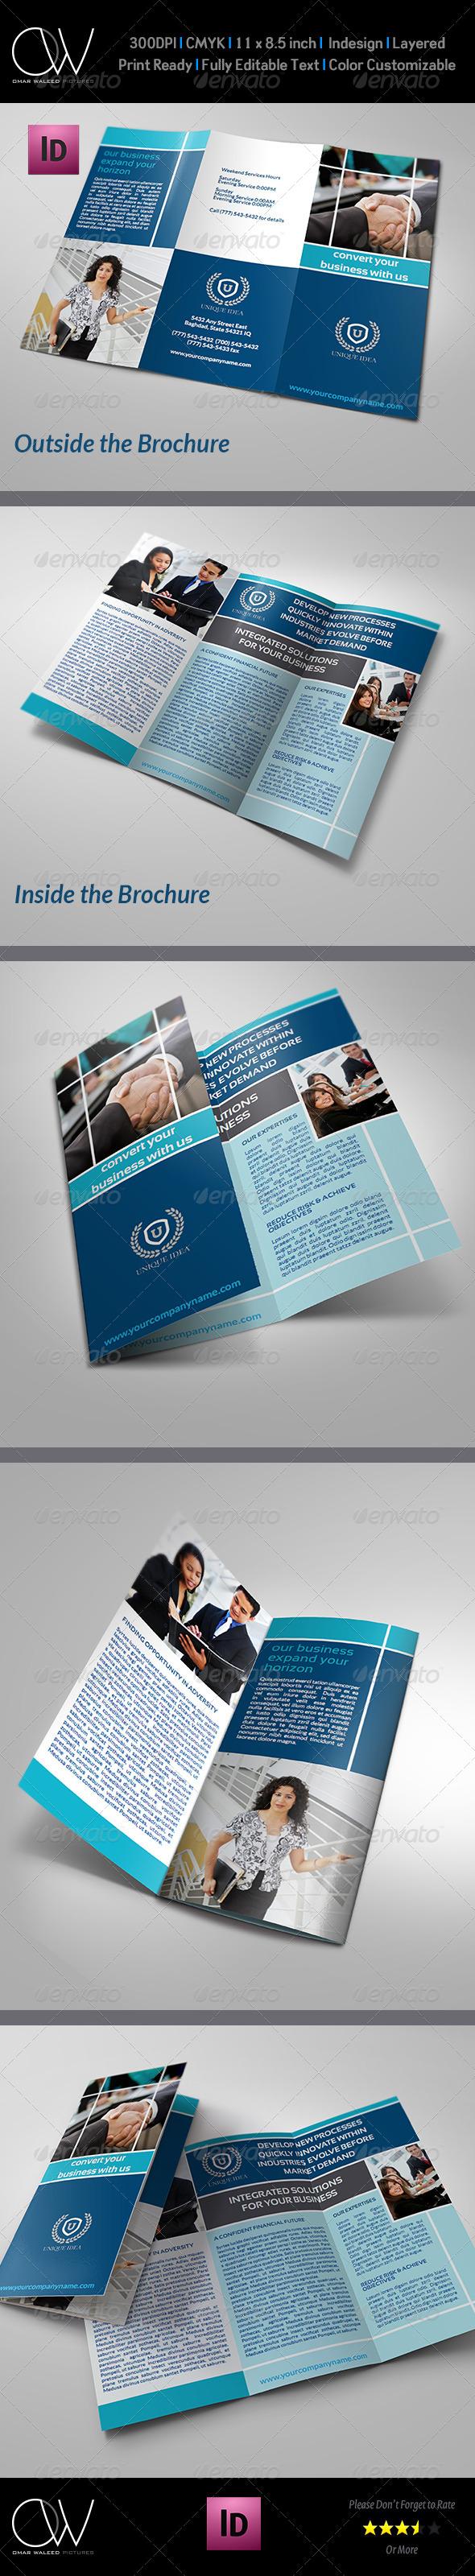 Company Brochure Tri-Fold Brochure Vol.4 - Corporate Brochures